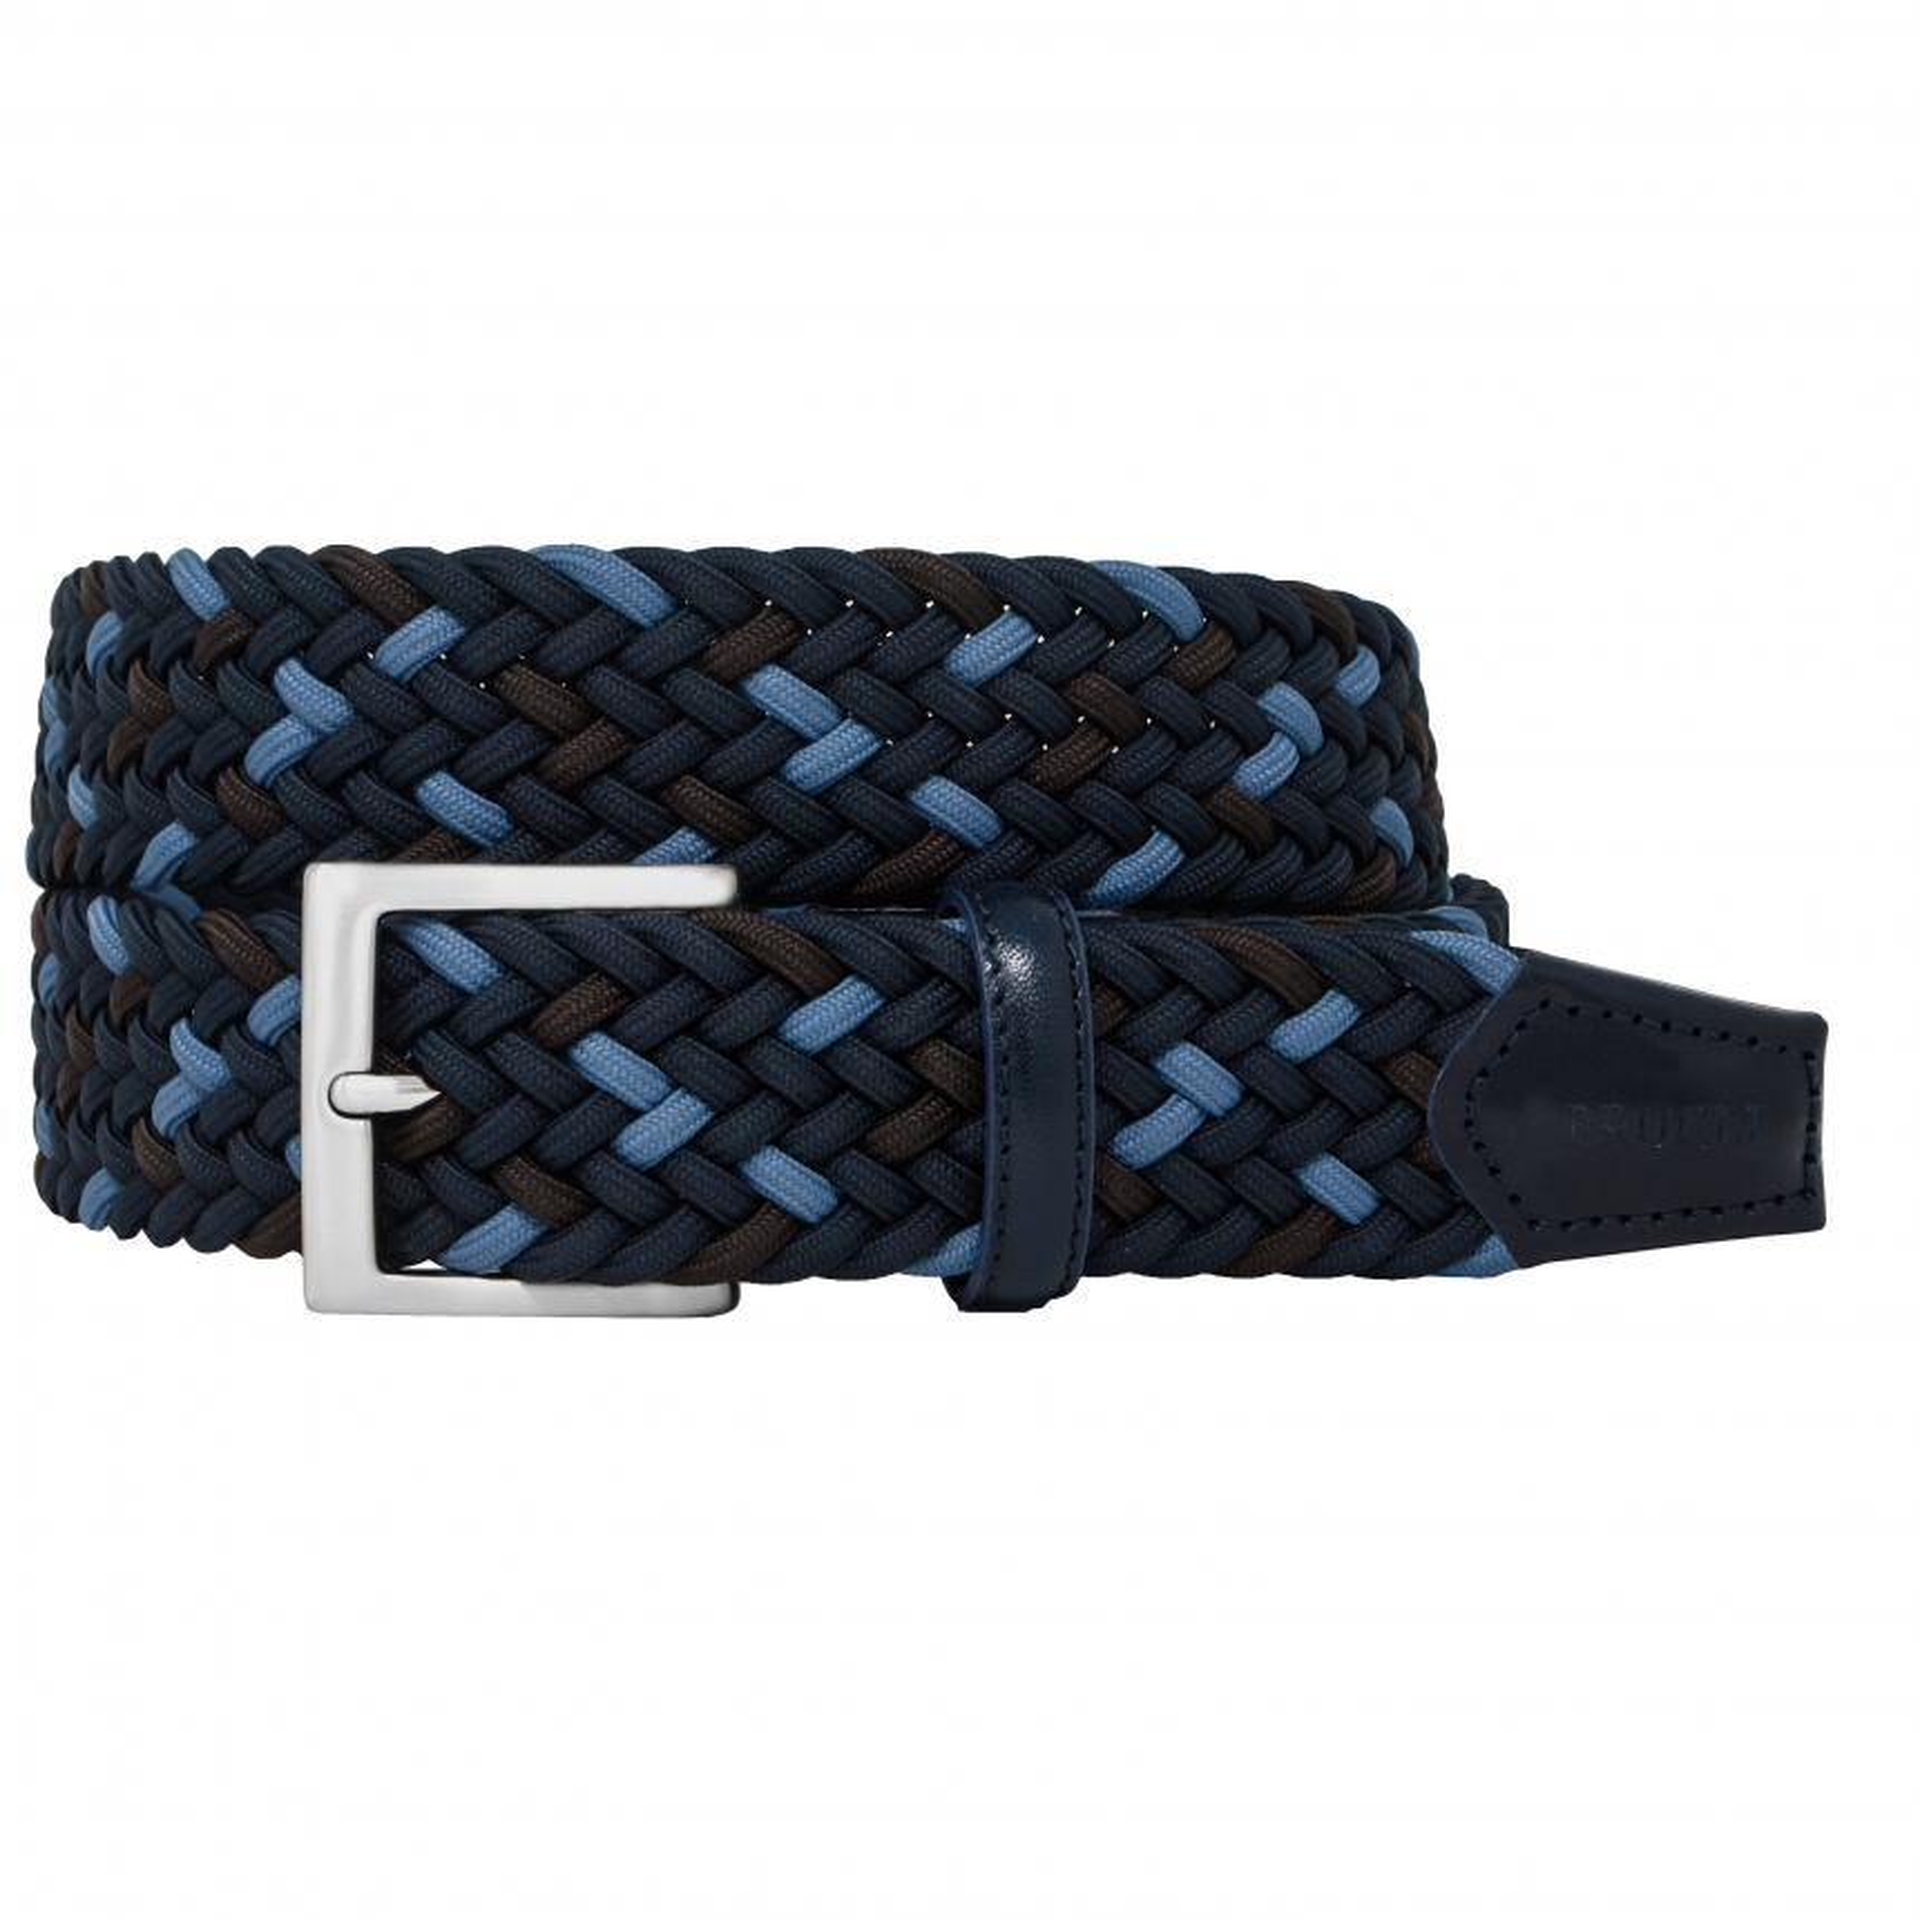 Cintura elastica intrecciata blu marrone e celeste